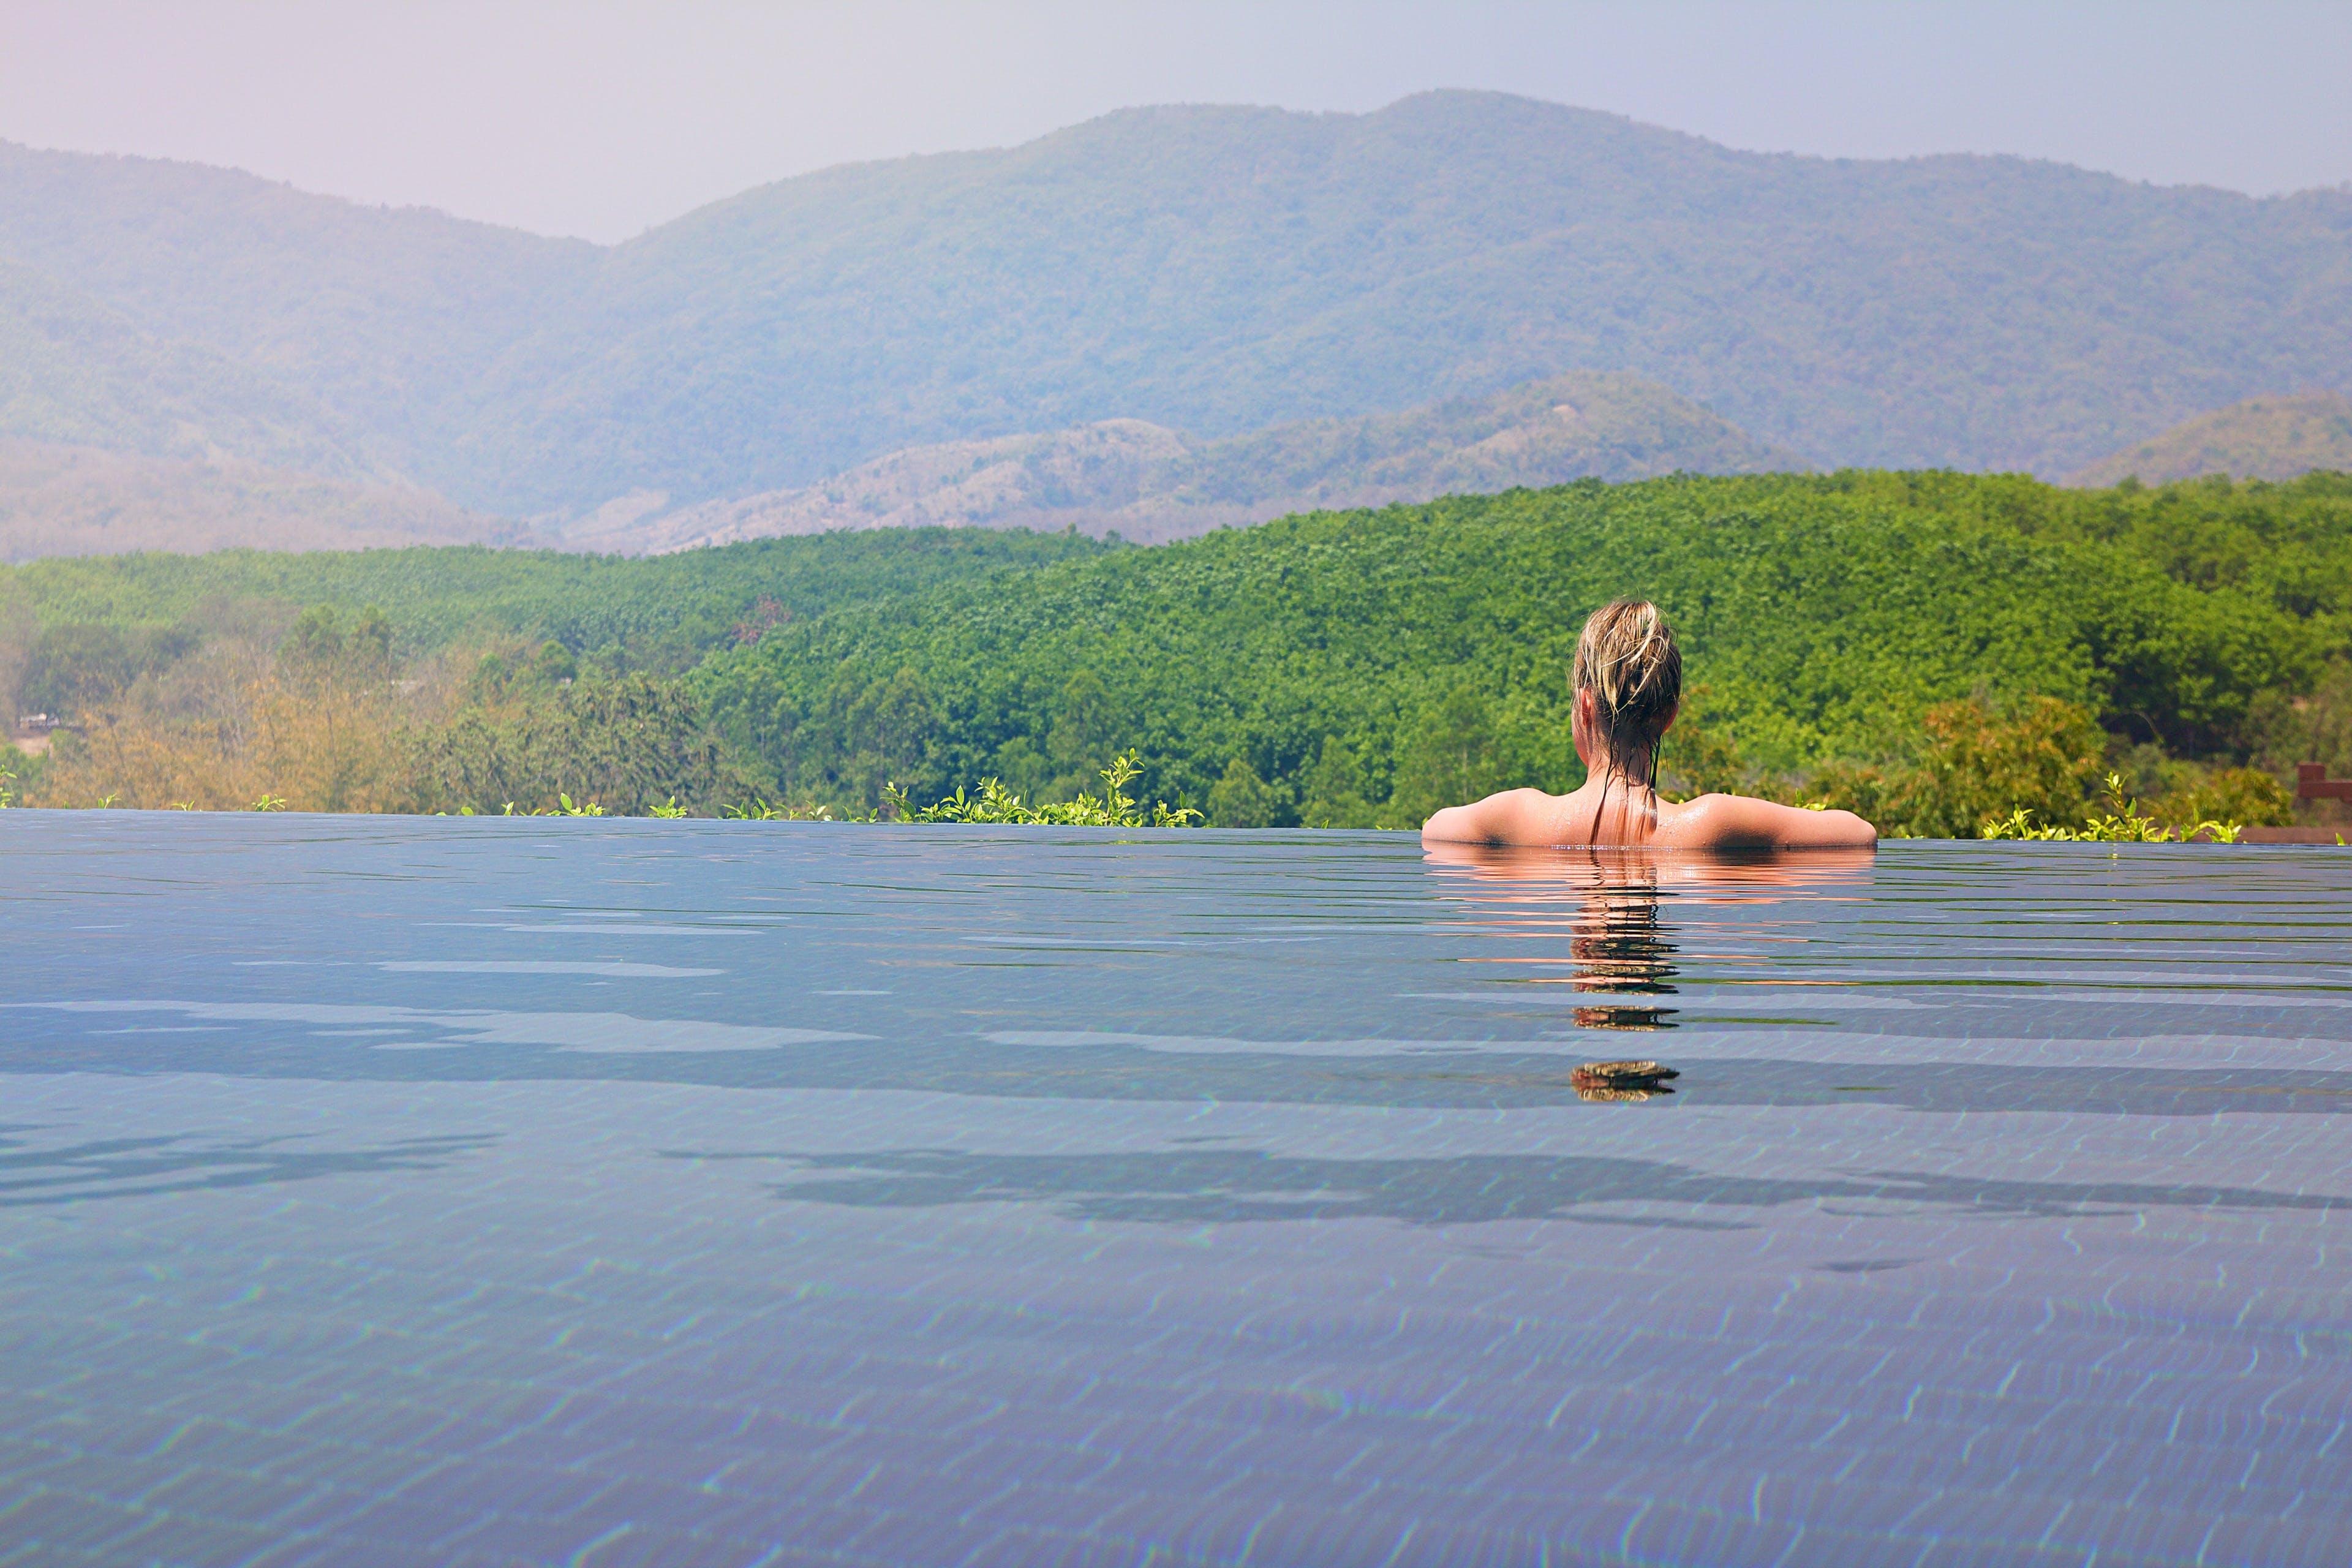 Kostenloses Stock Foto zu ausblick, baden, entspannung, erholung